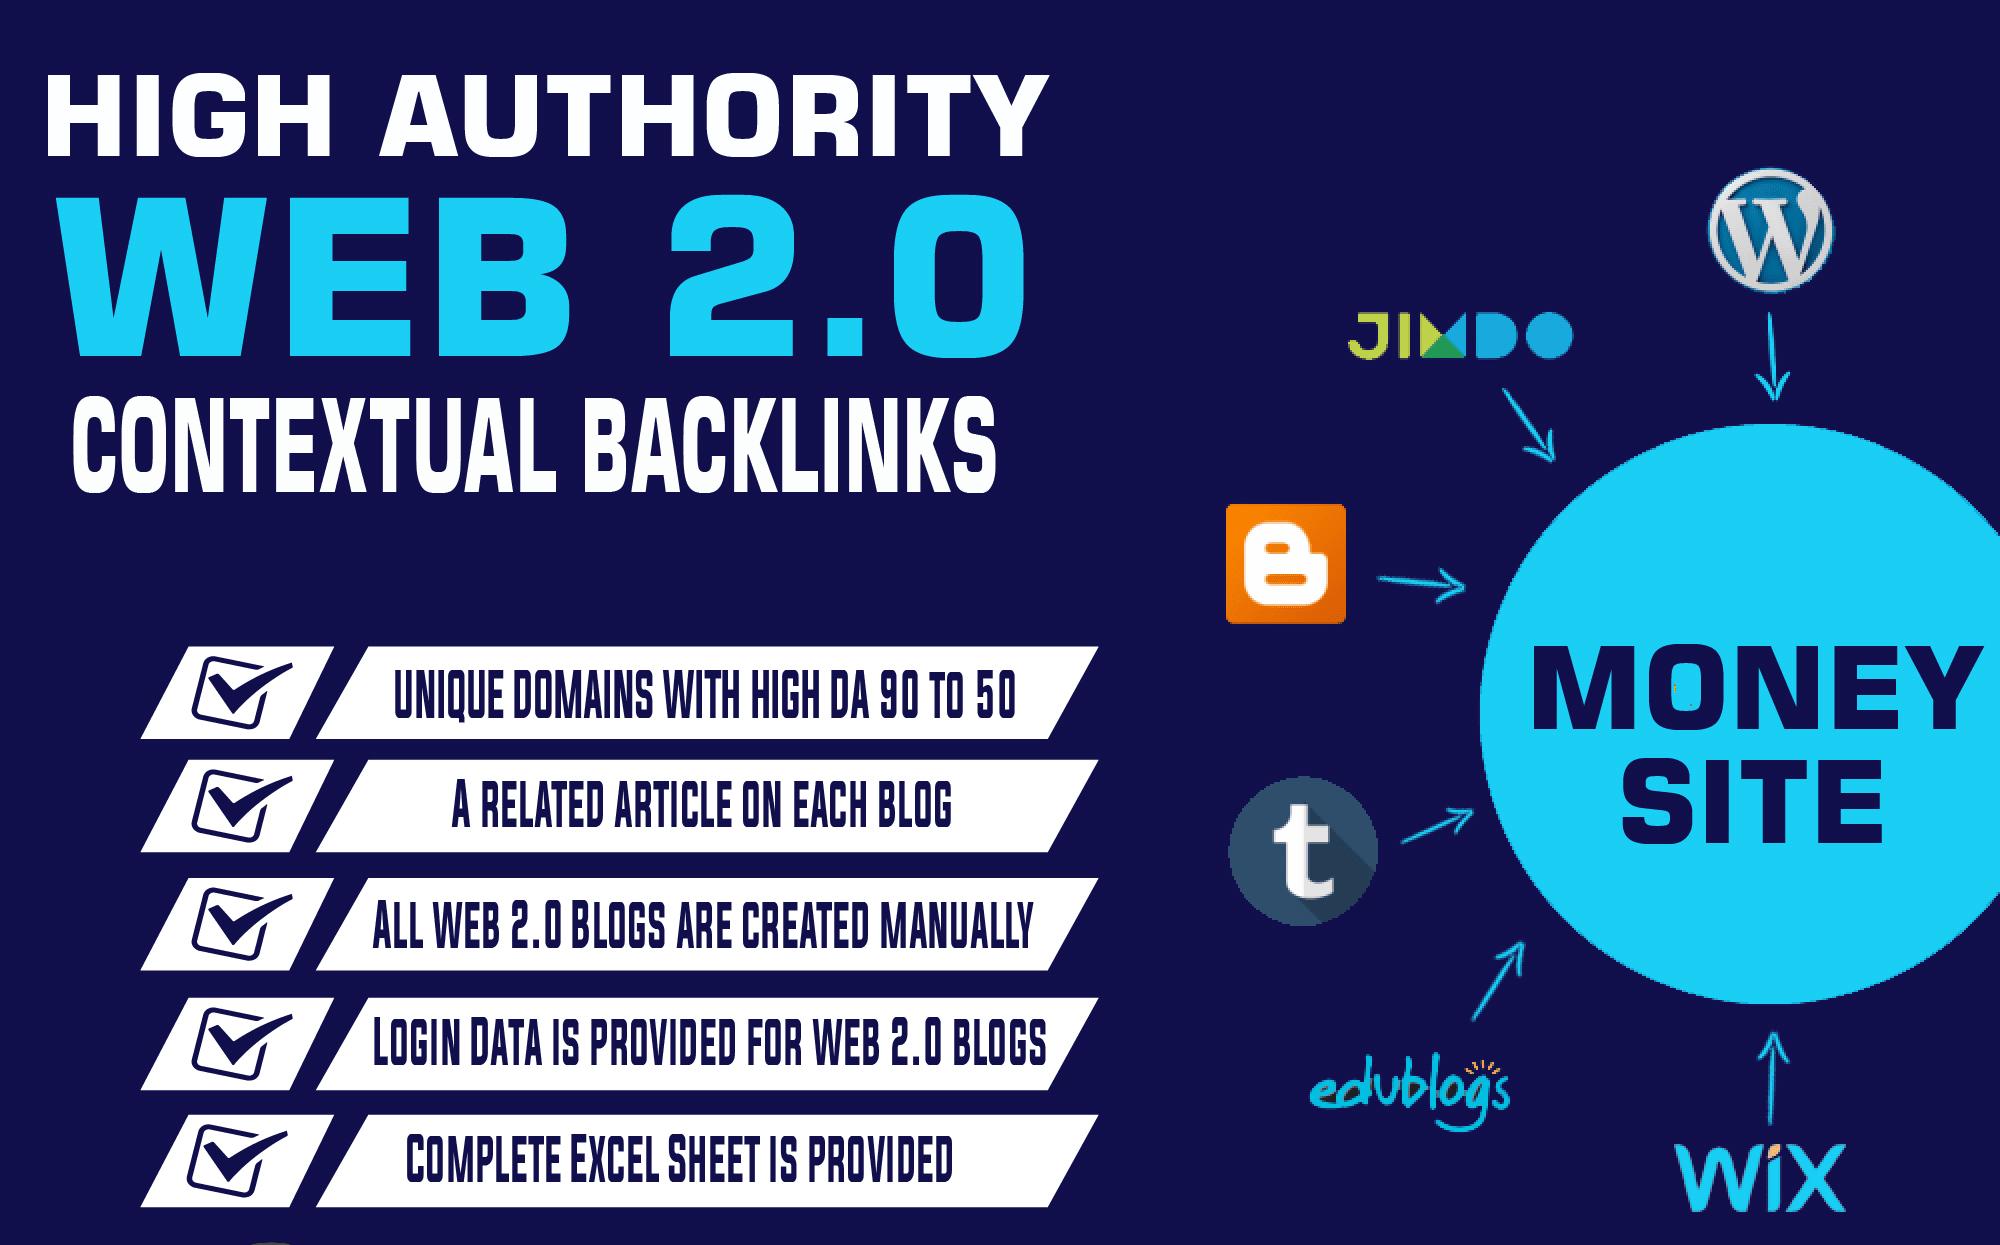 create 6 super web 2 0 blog properties contextual backlinks